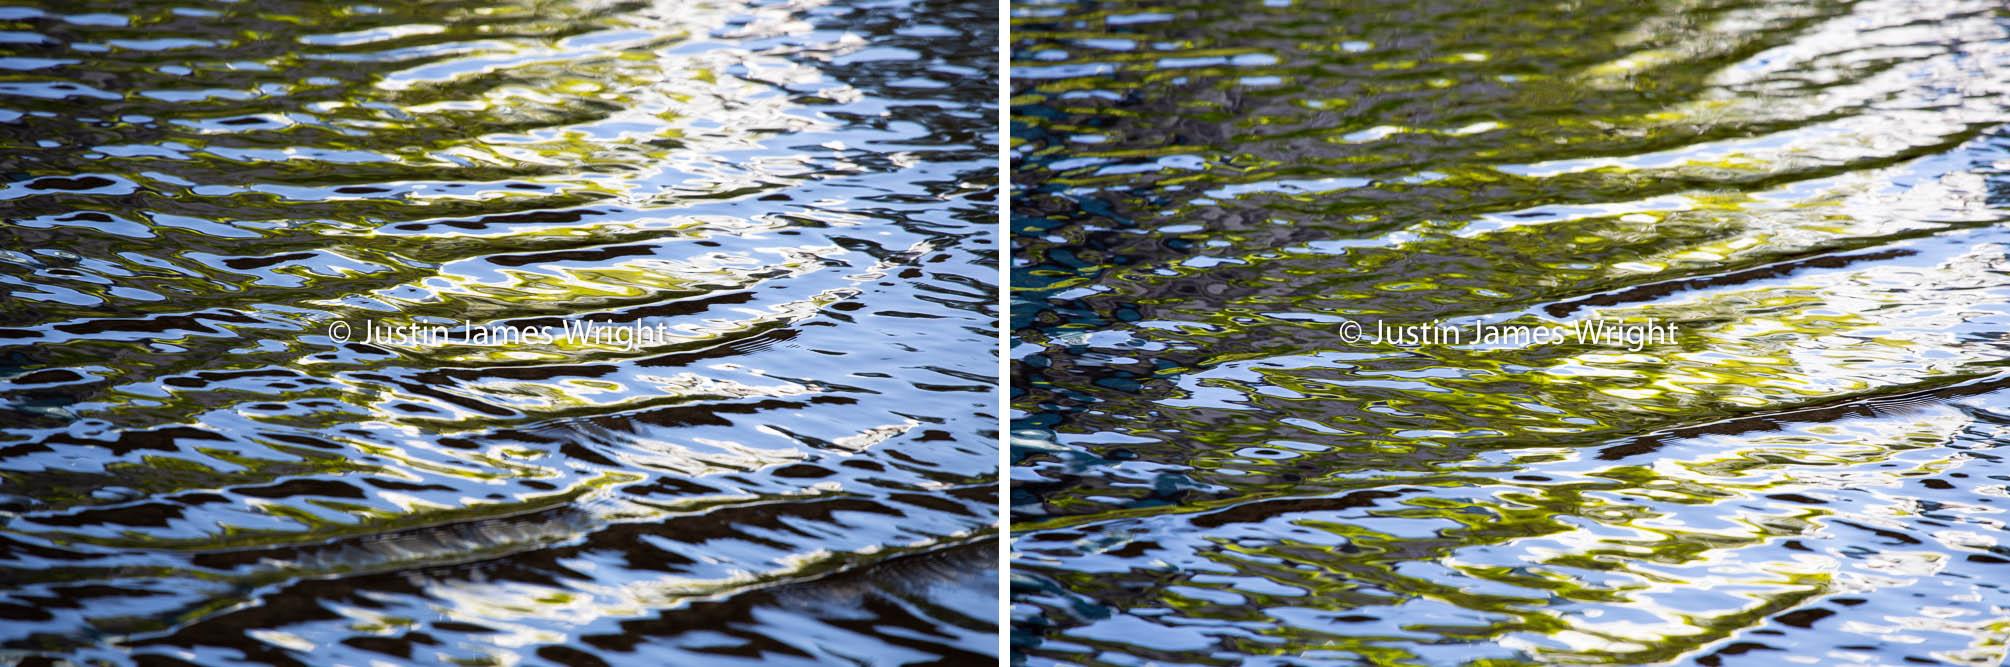 14. Urban Reflections. Justin James Wright. Philippine Photography. Manila Photography. Philippine Fine Art Photography.jpg